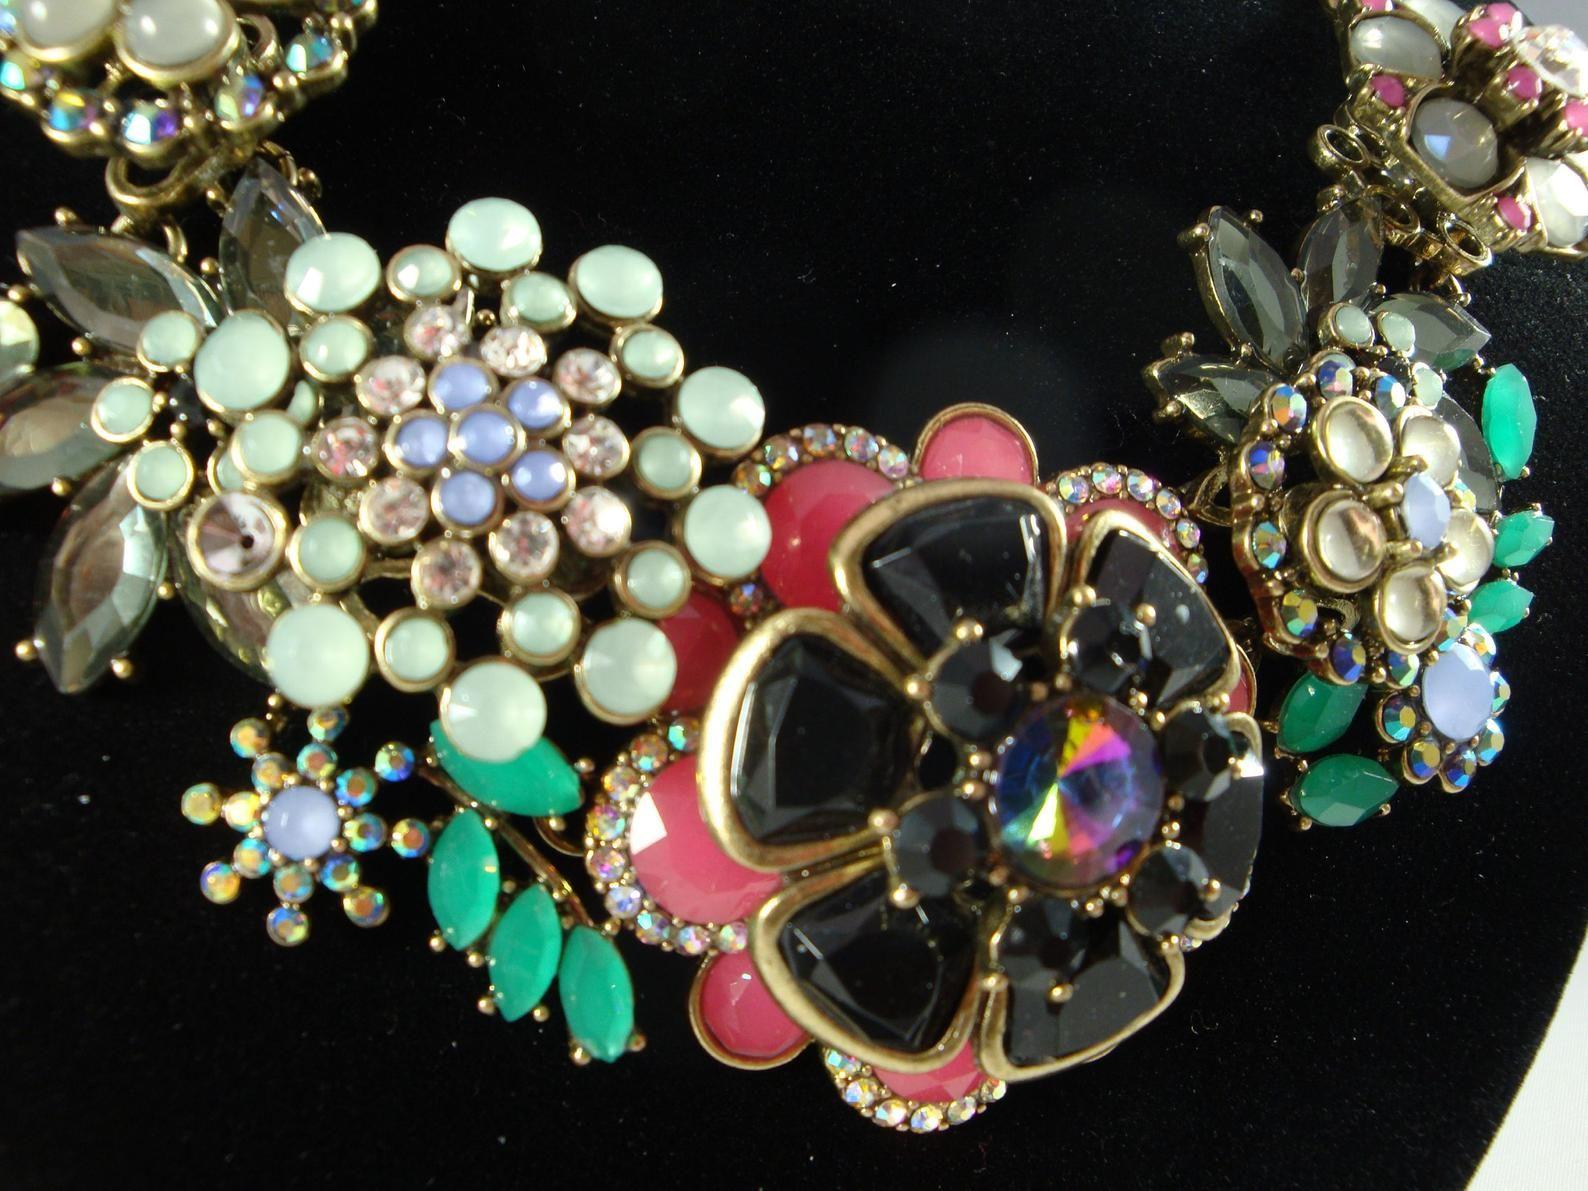 Vintage Orange Amber Brown Bib Necklace Glass Jewel Bib Necklace Jeweled Statement Bib Necklace Joan Rivers Glass Jewel Bib Necklace